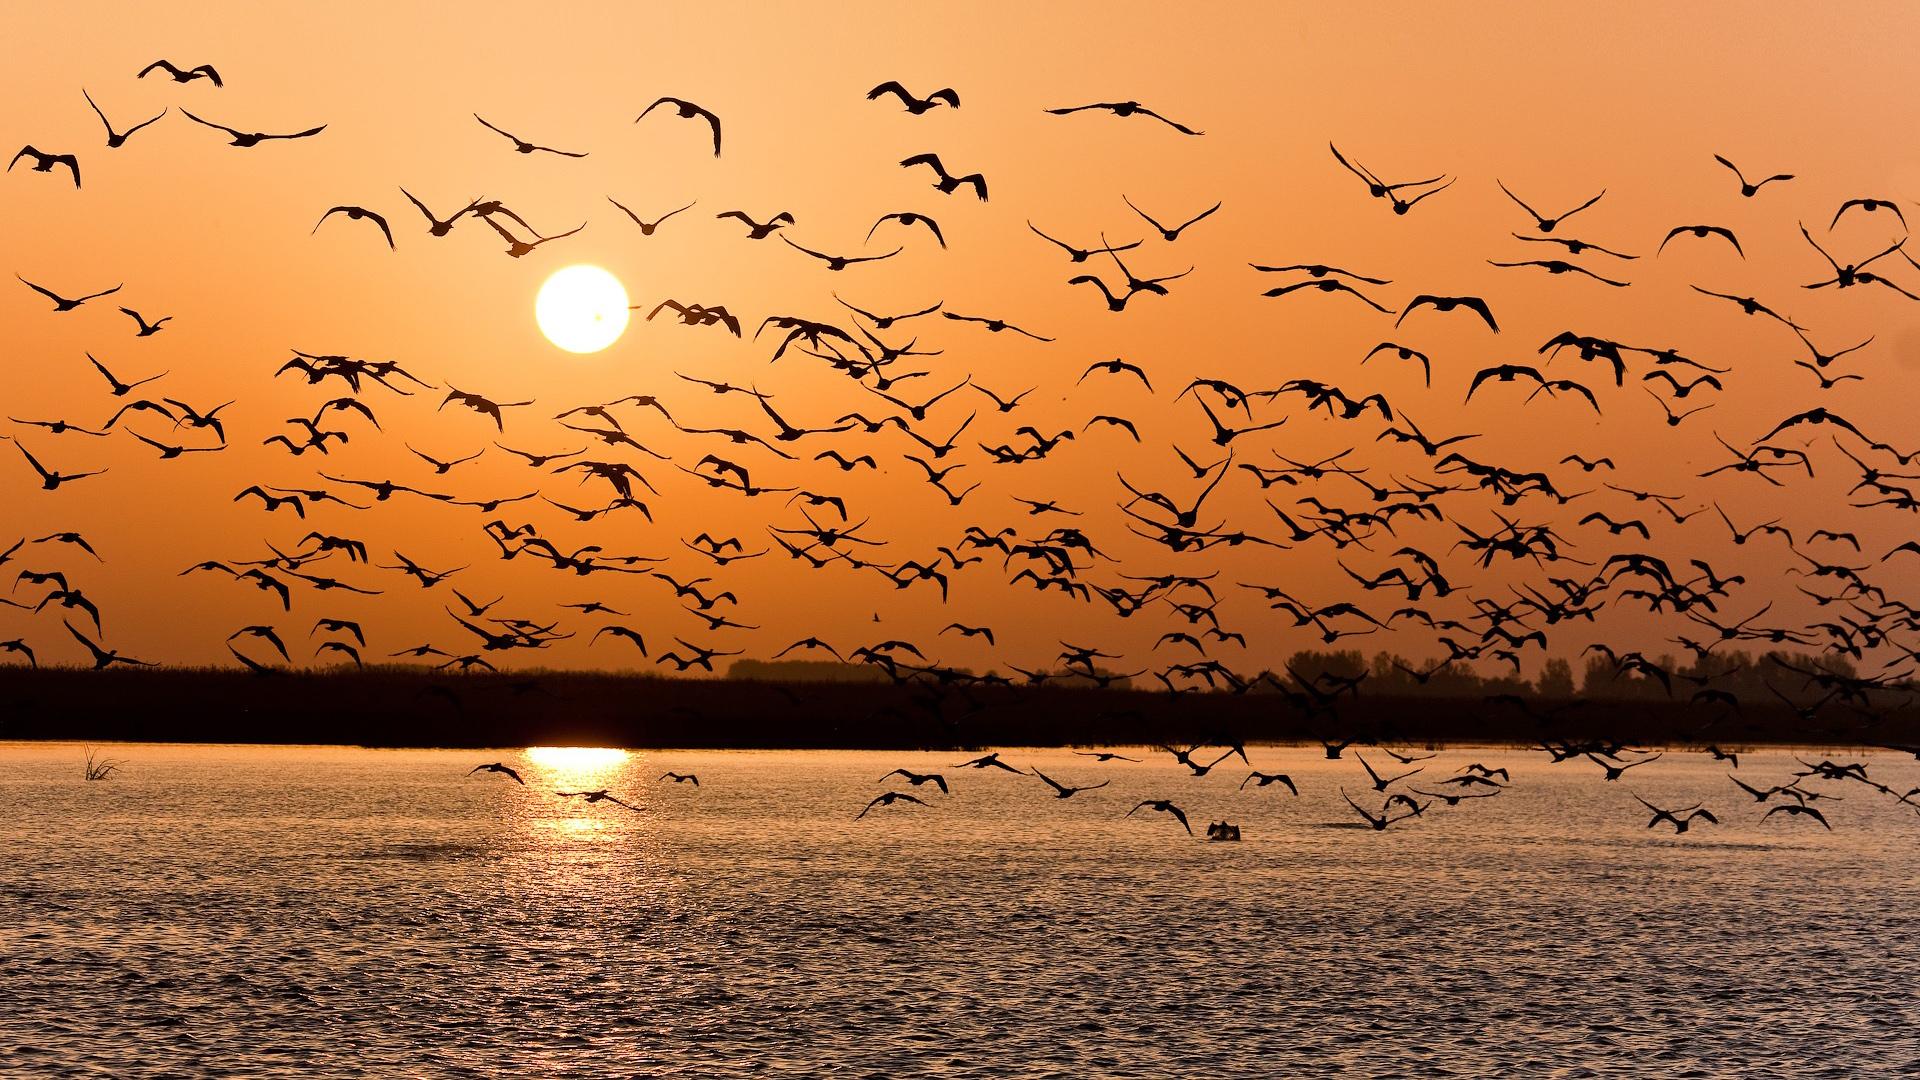 Download desktop wallpaper Flock of birds at sunset